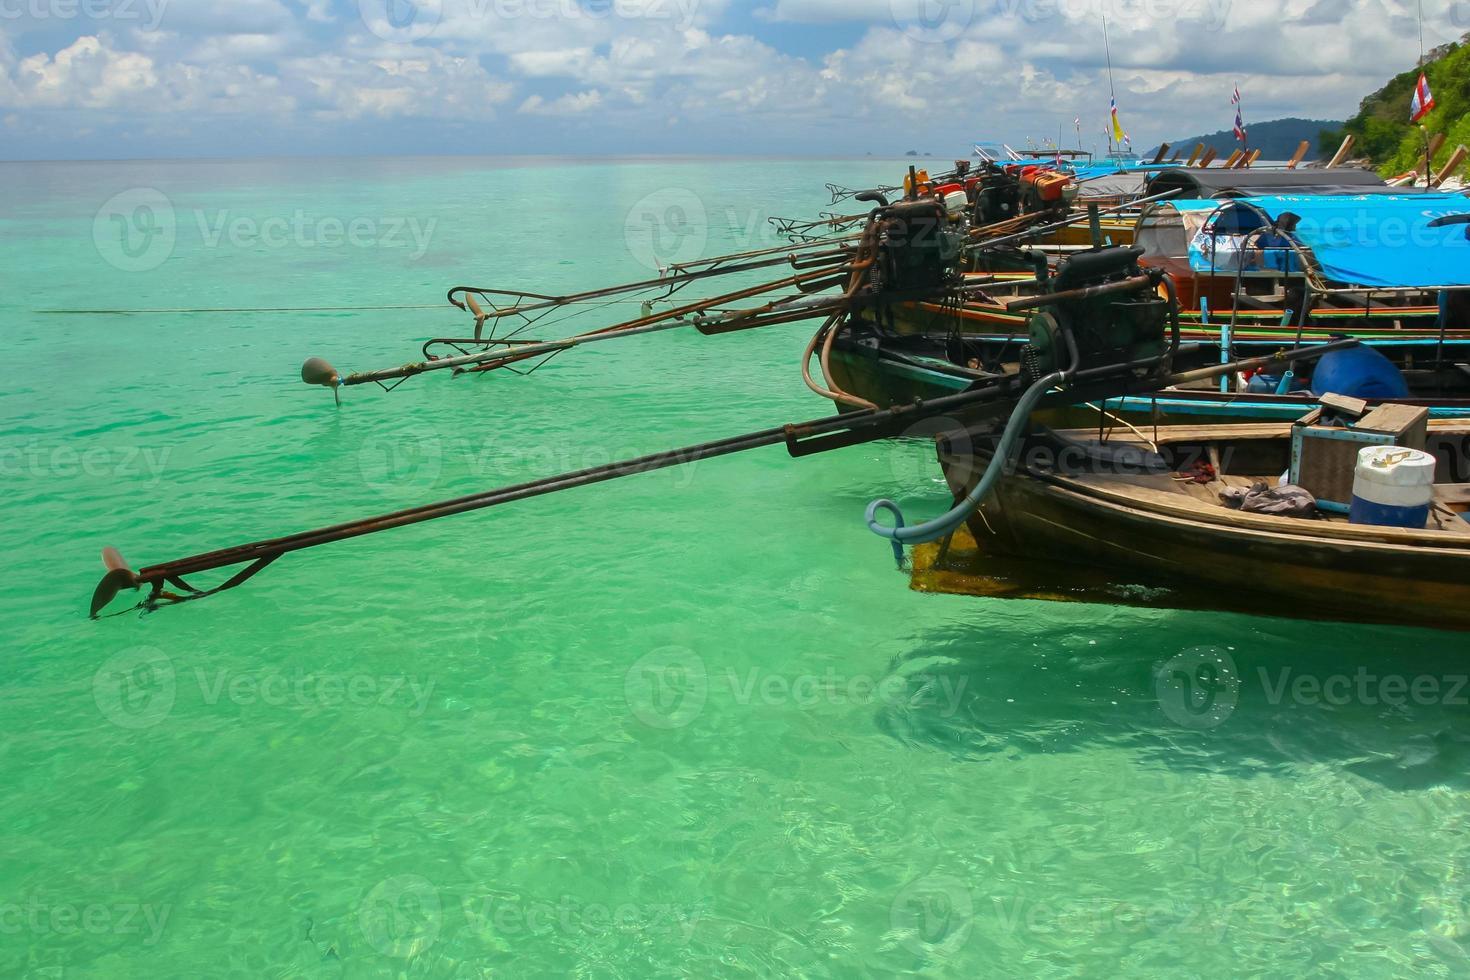 Ko Poda, Thaïlande, 2020 - longboats d'affilée photo